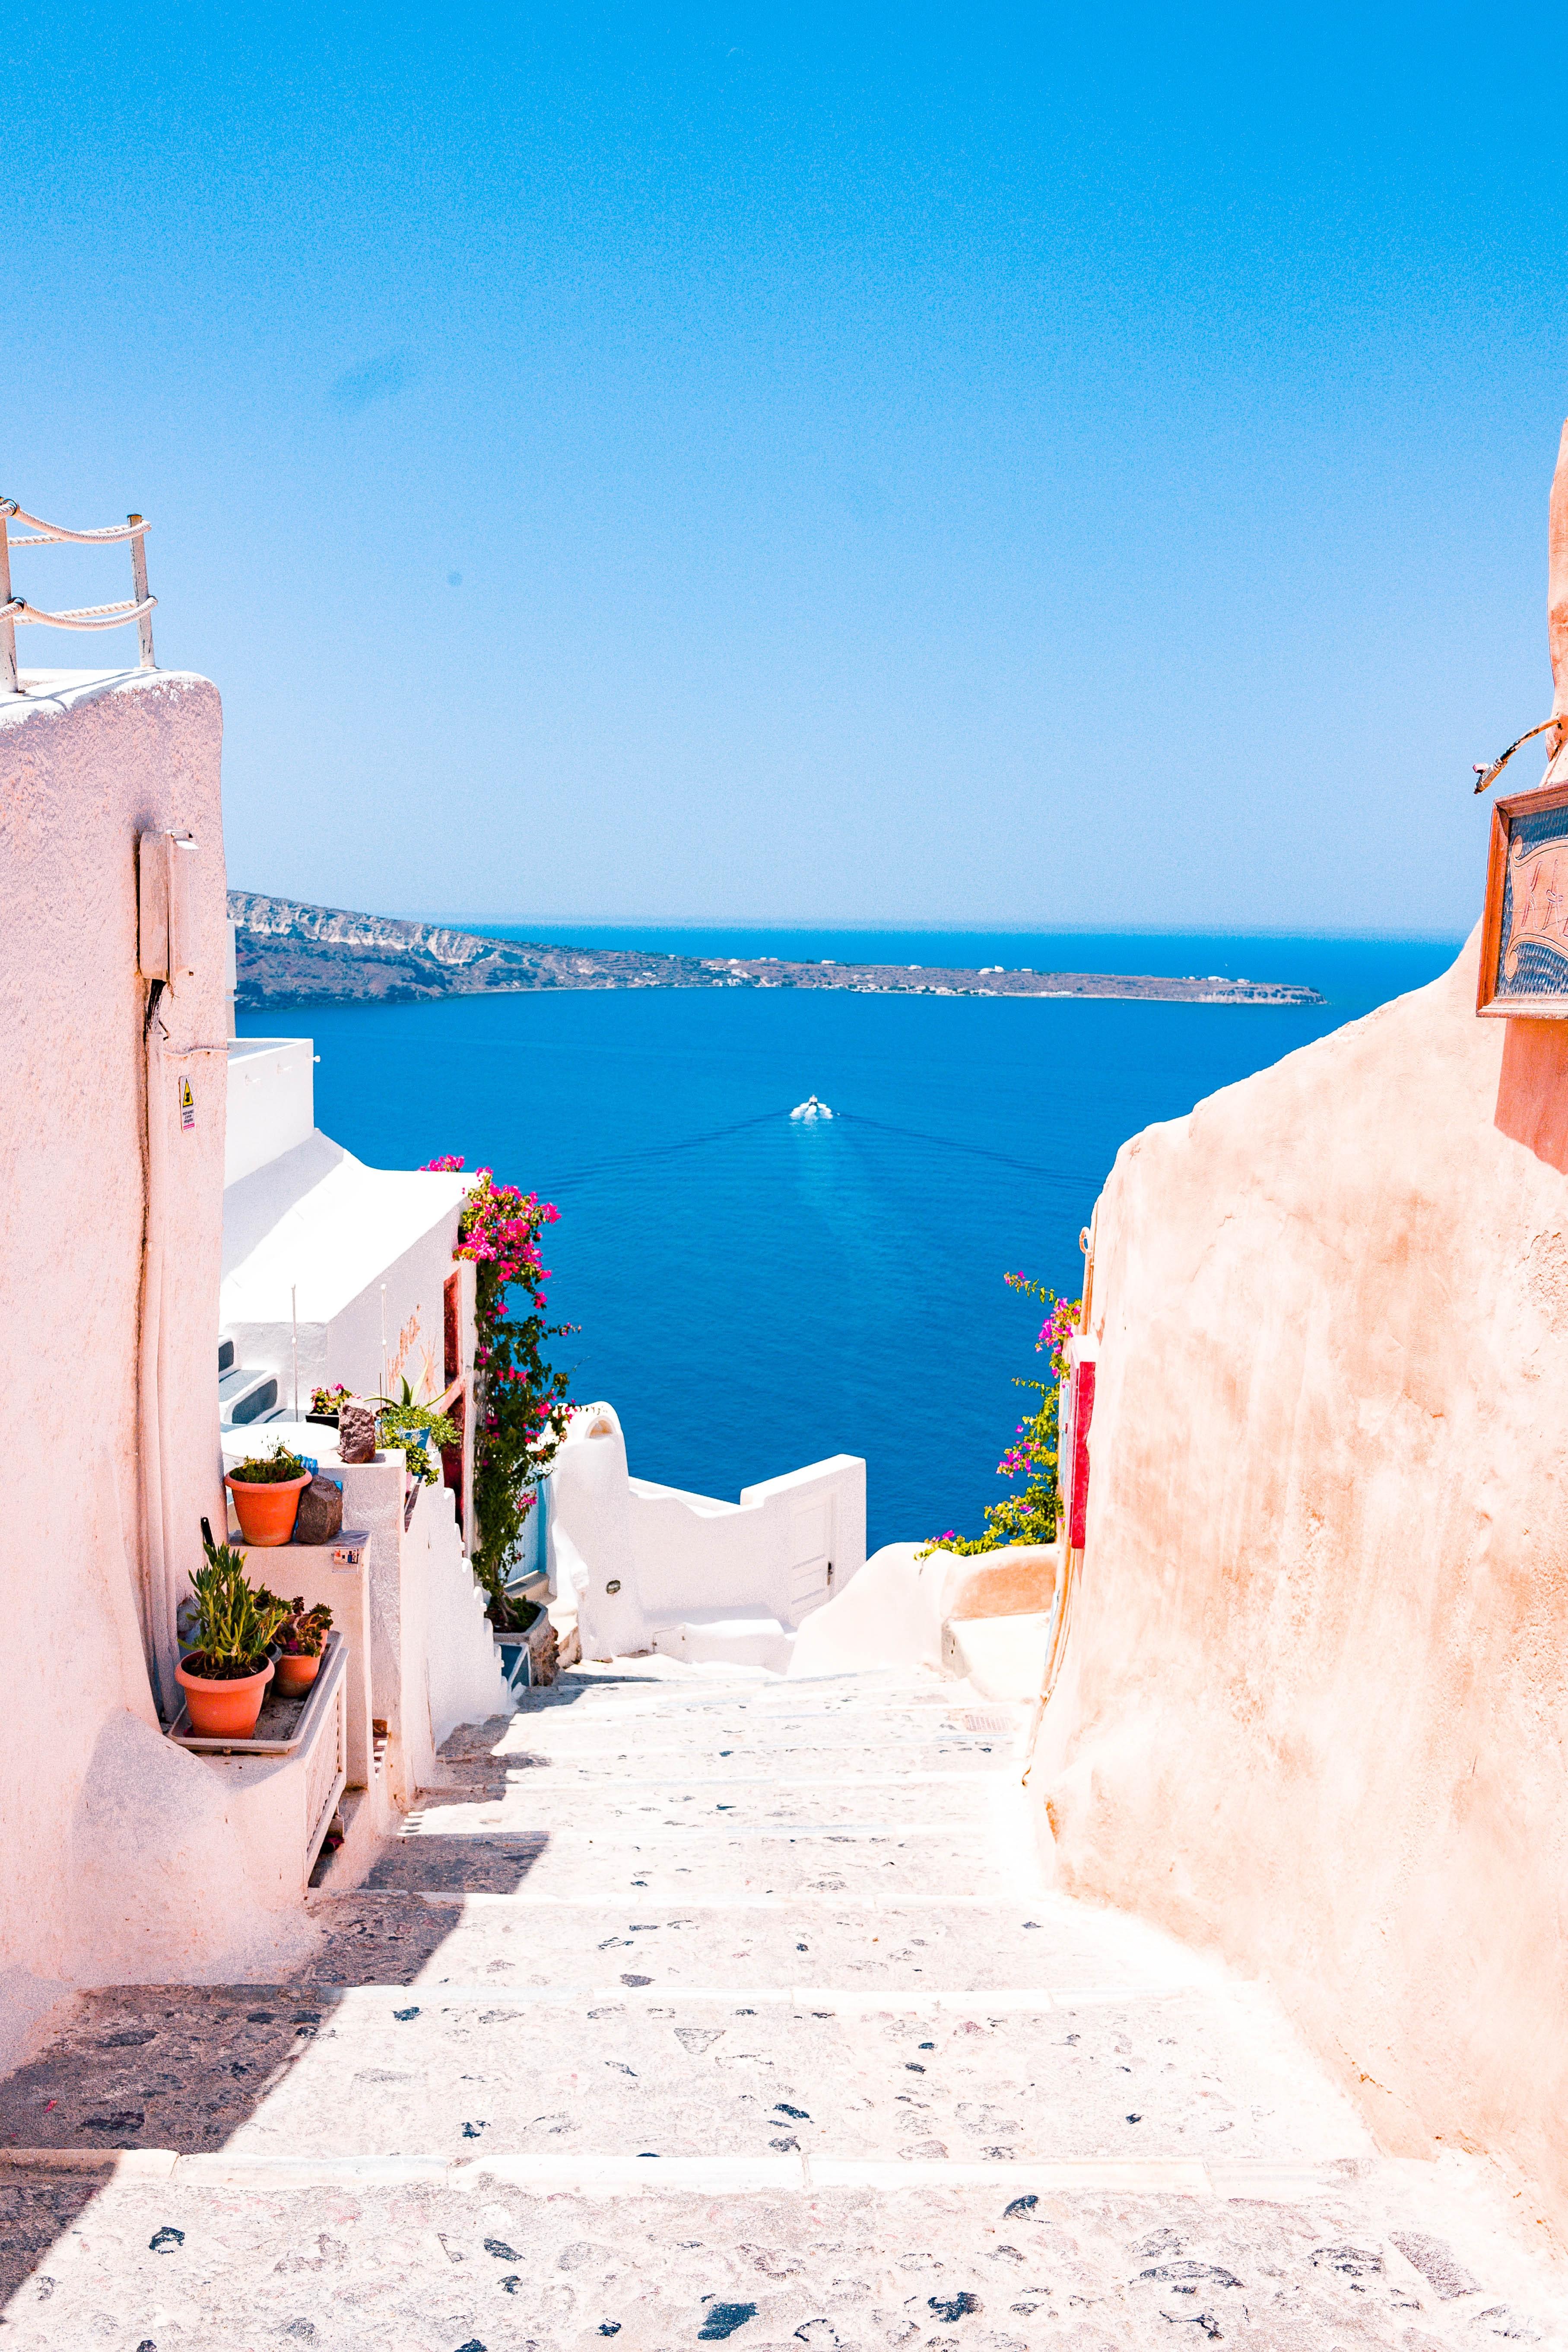 Santorini, Greece sea view with pink buildings